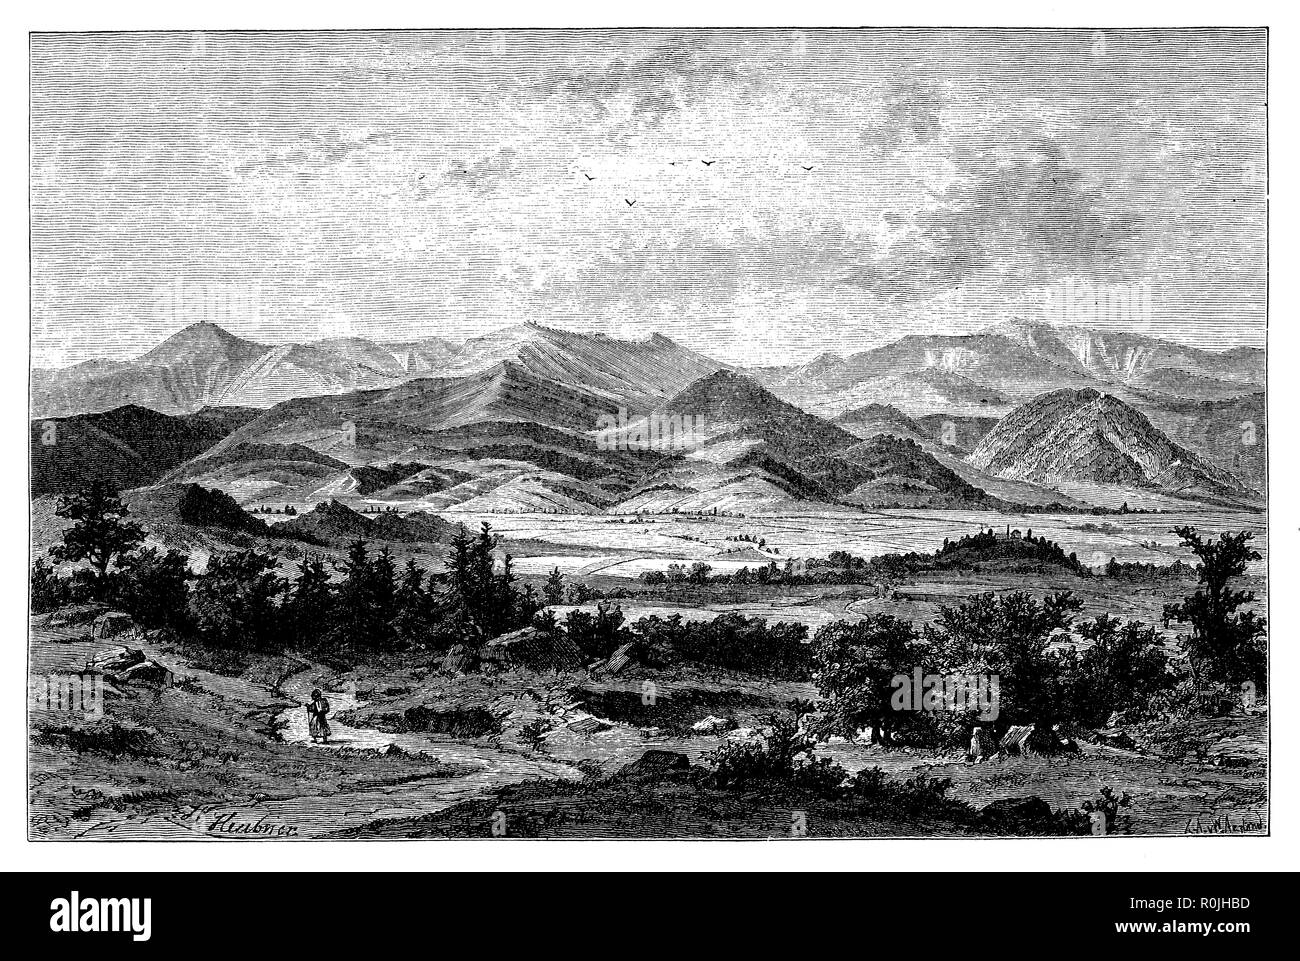 Riesengebirge, seen from the Hirschberg valley,   1887 - Stock Image